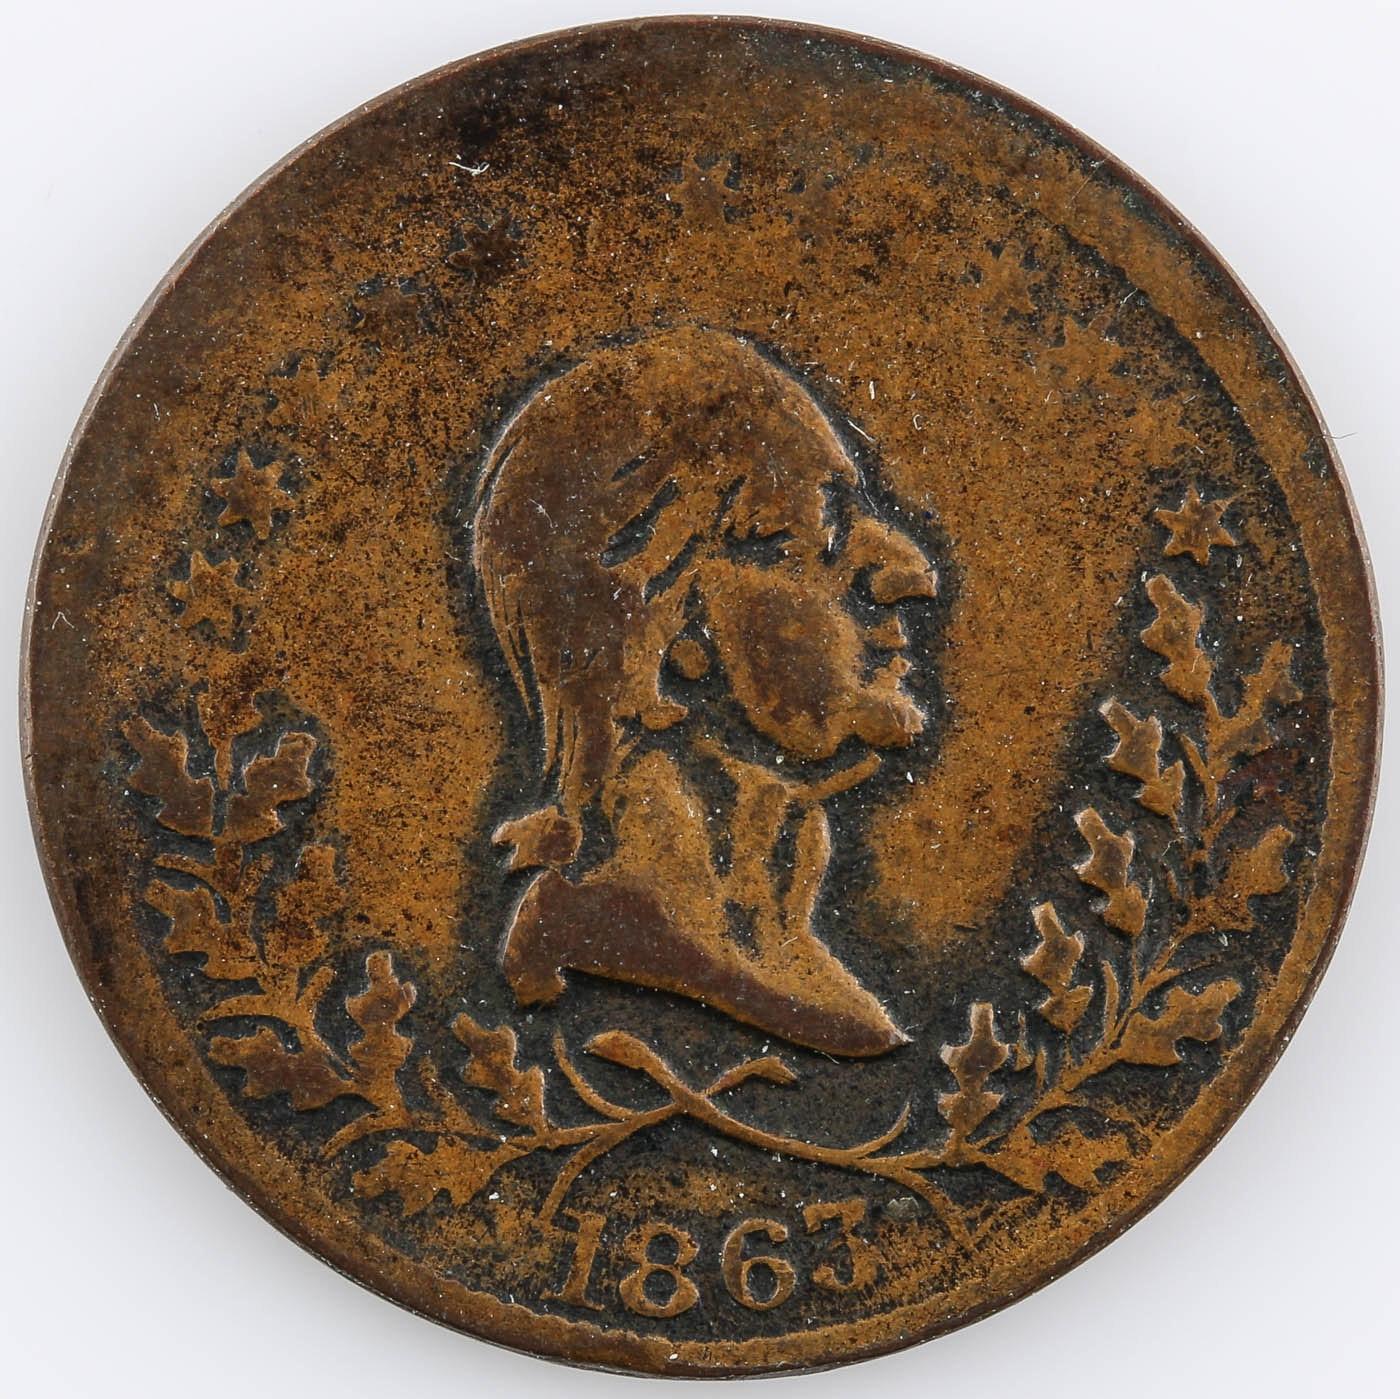 1863 Civil War Era Token Including George Washington Bust on Obverse